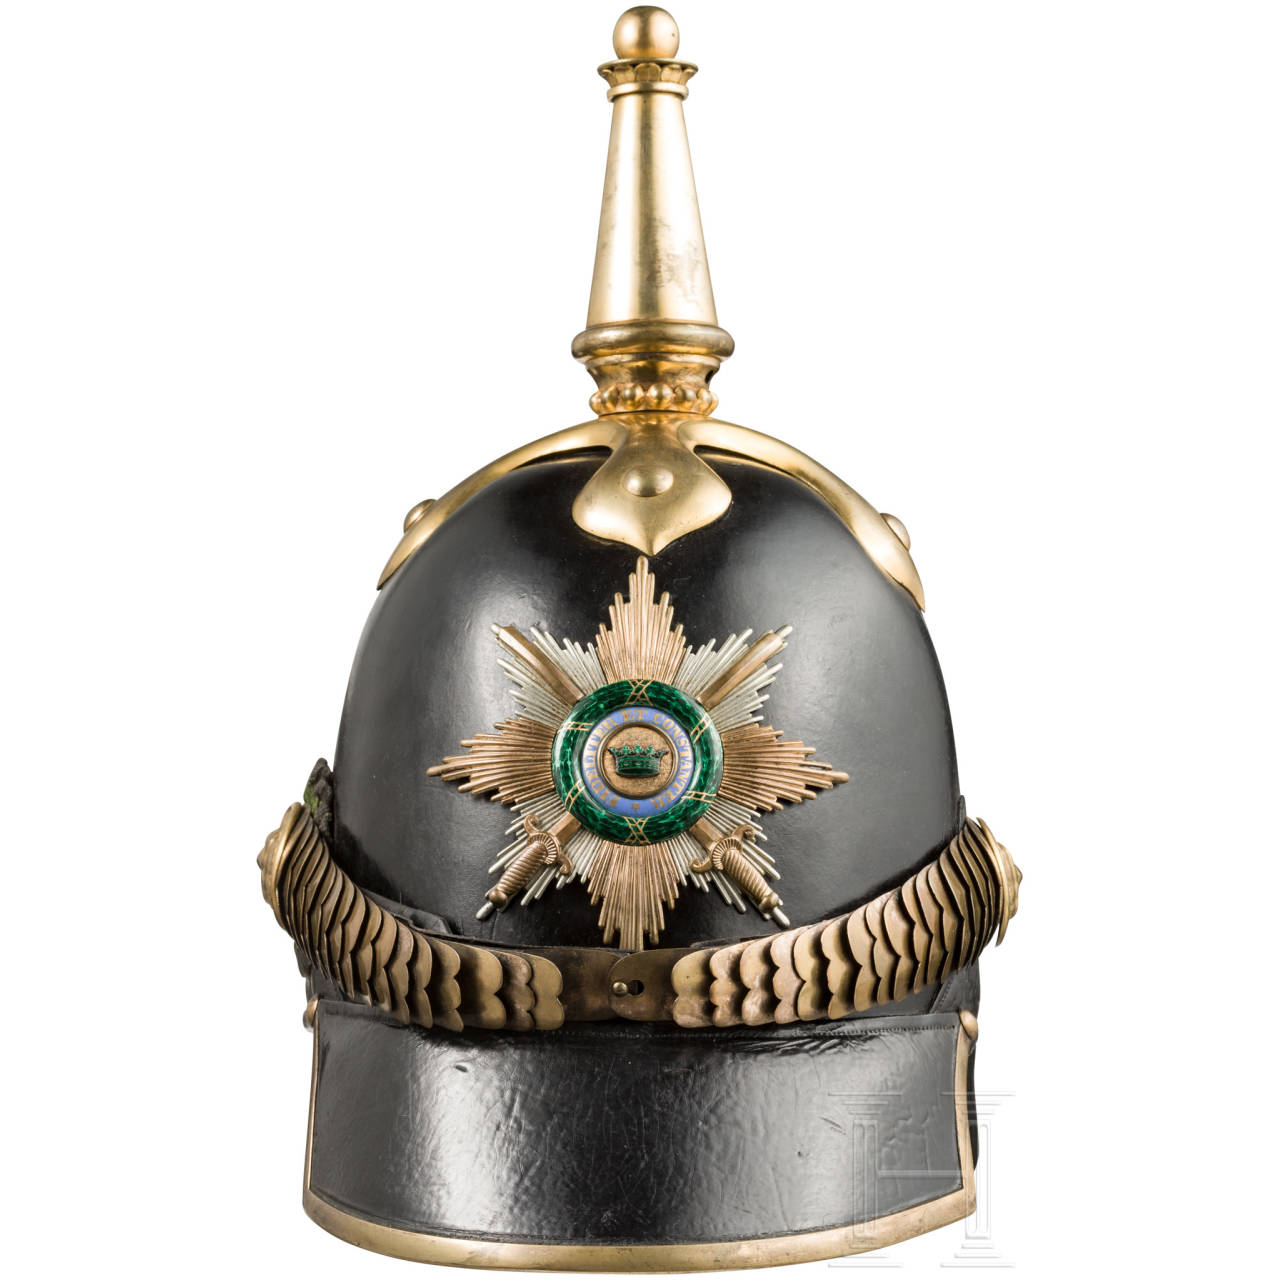 A model 1853 helmet for officers of the ducal infantry